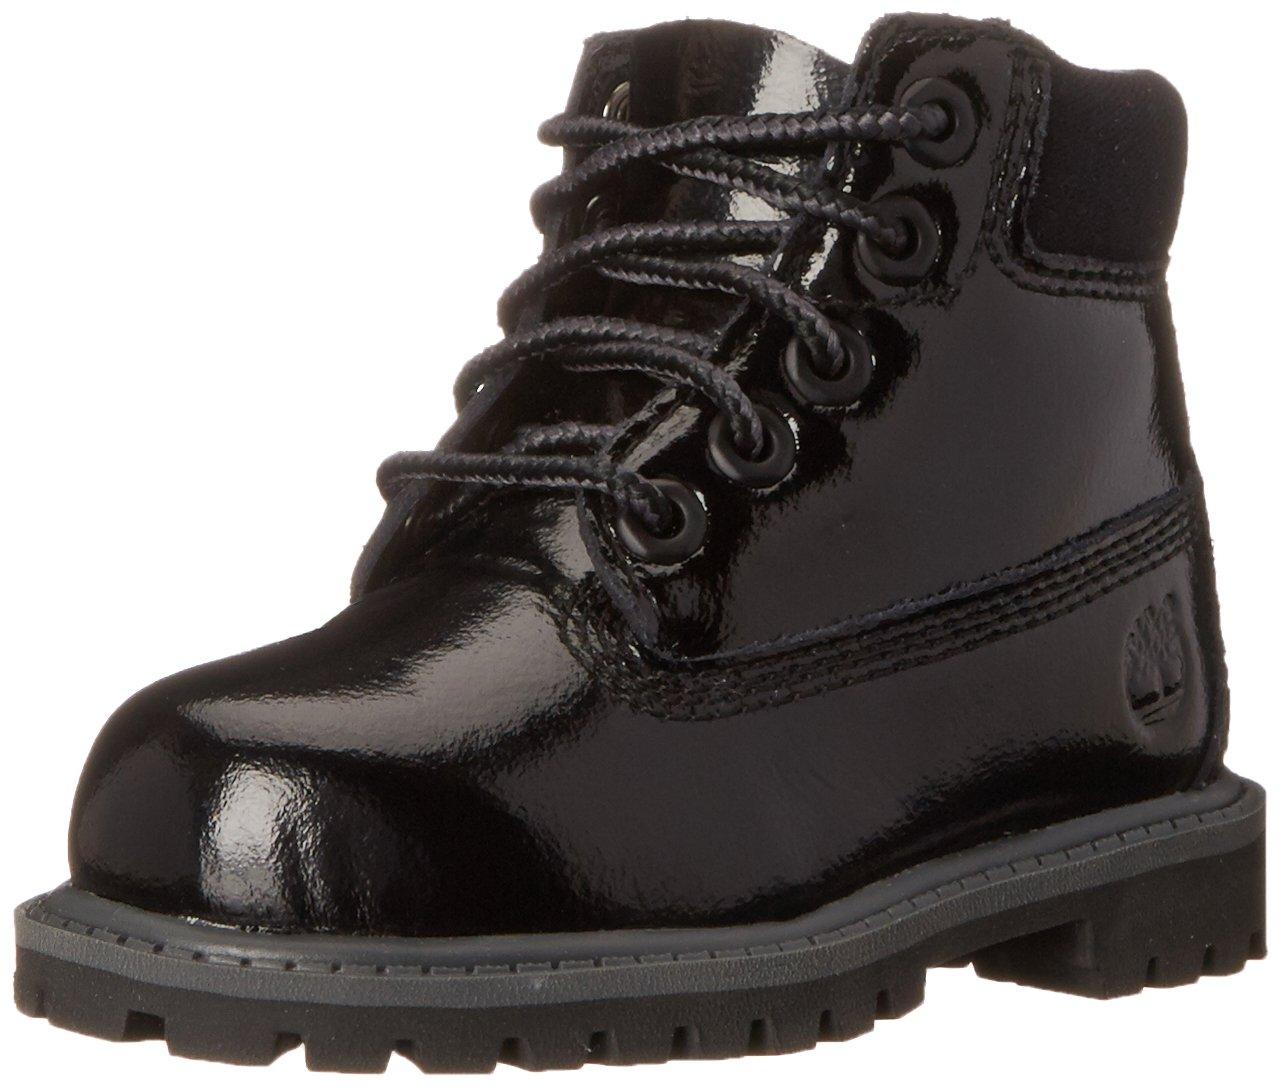 Timberland 6 Inch Premium Waterproof (Big Kids) Boots (4, Black Shine)